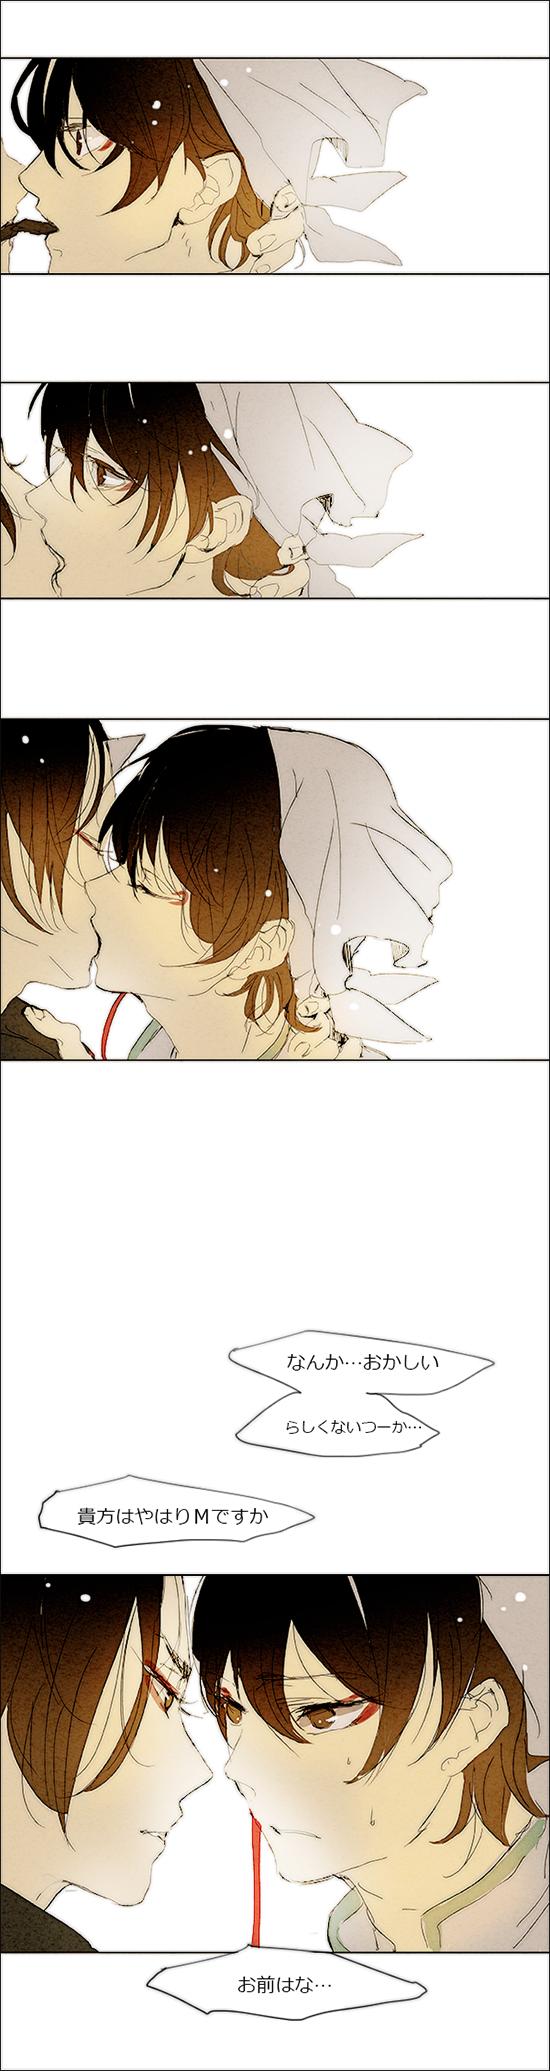 Tags: Anime, Ihirotang, Hoozuki no Reitetsu, Hakutaku (Hoozuki no Reitetsu), Hoozuki (Hoozuki no Reitetsu), Fanart From Pixiv, Translation Request, Pixiv, Fanart, Cool-headed Hoozuki